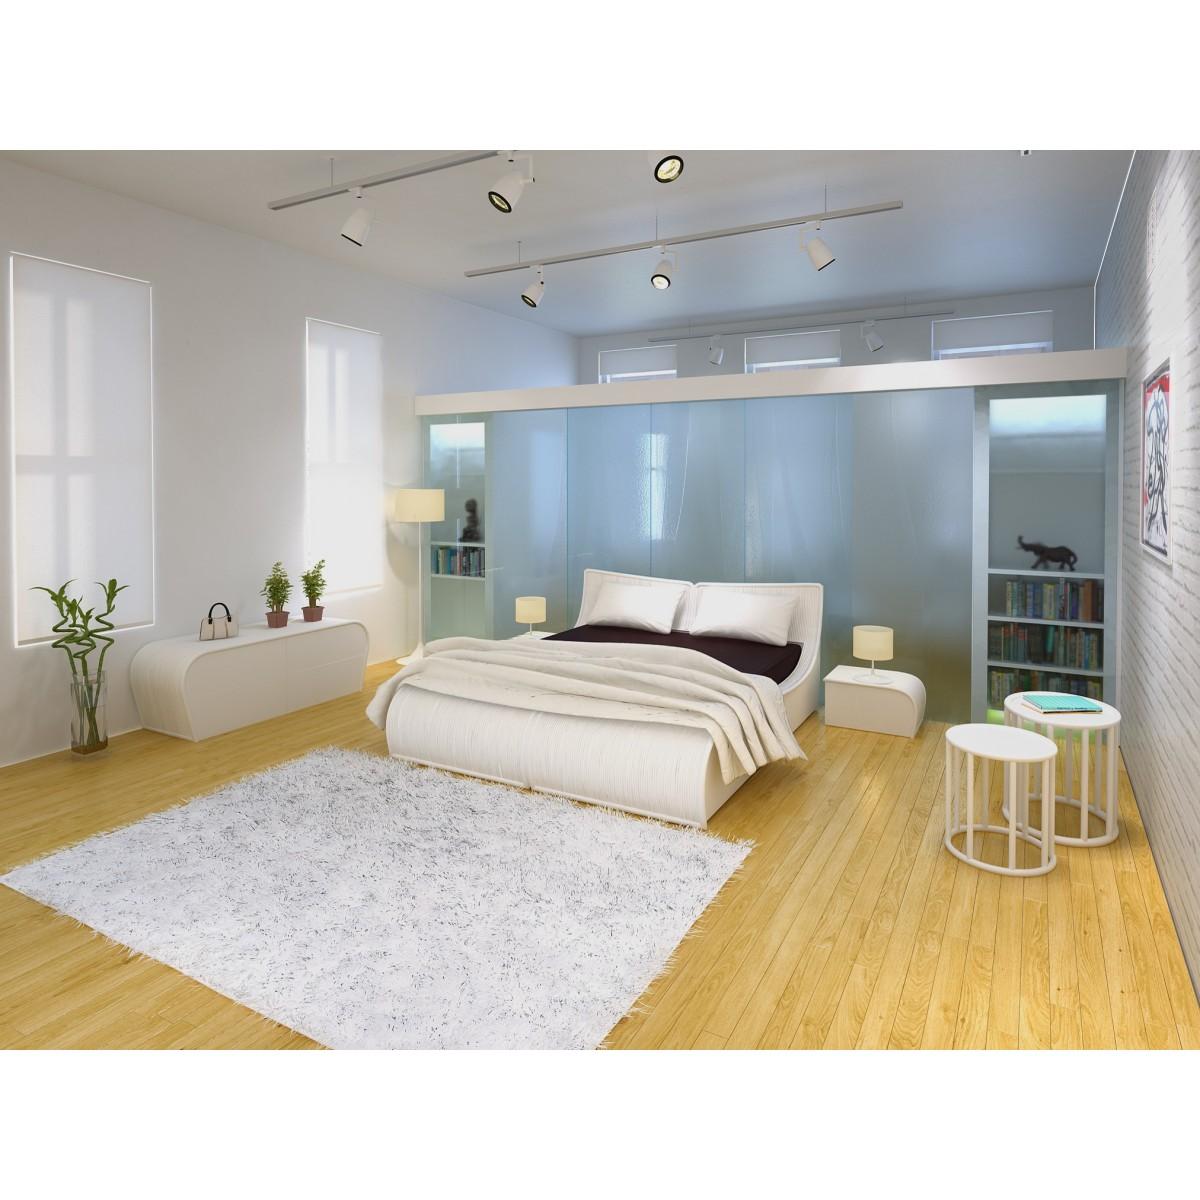 lit en rotin nui et filet de rotin. Black Bedroom Furniture Sets. Home Design Ideas